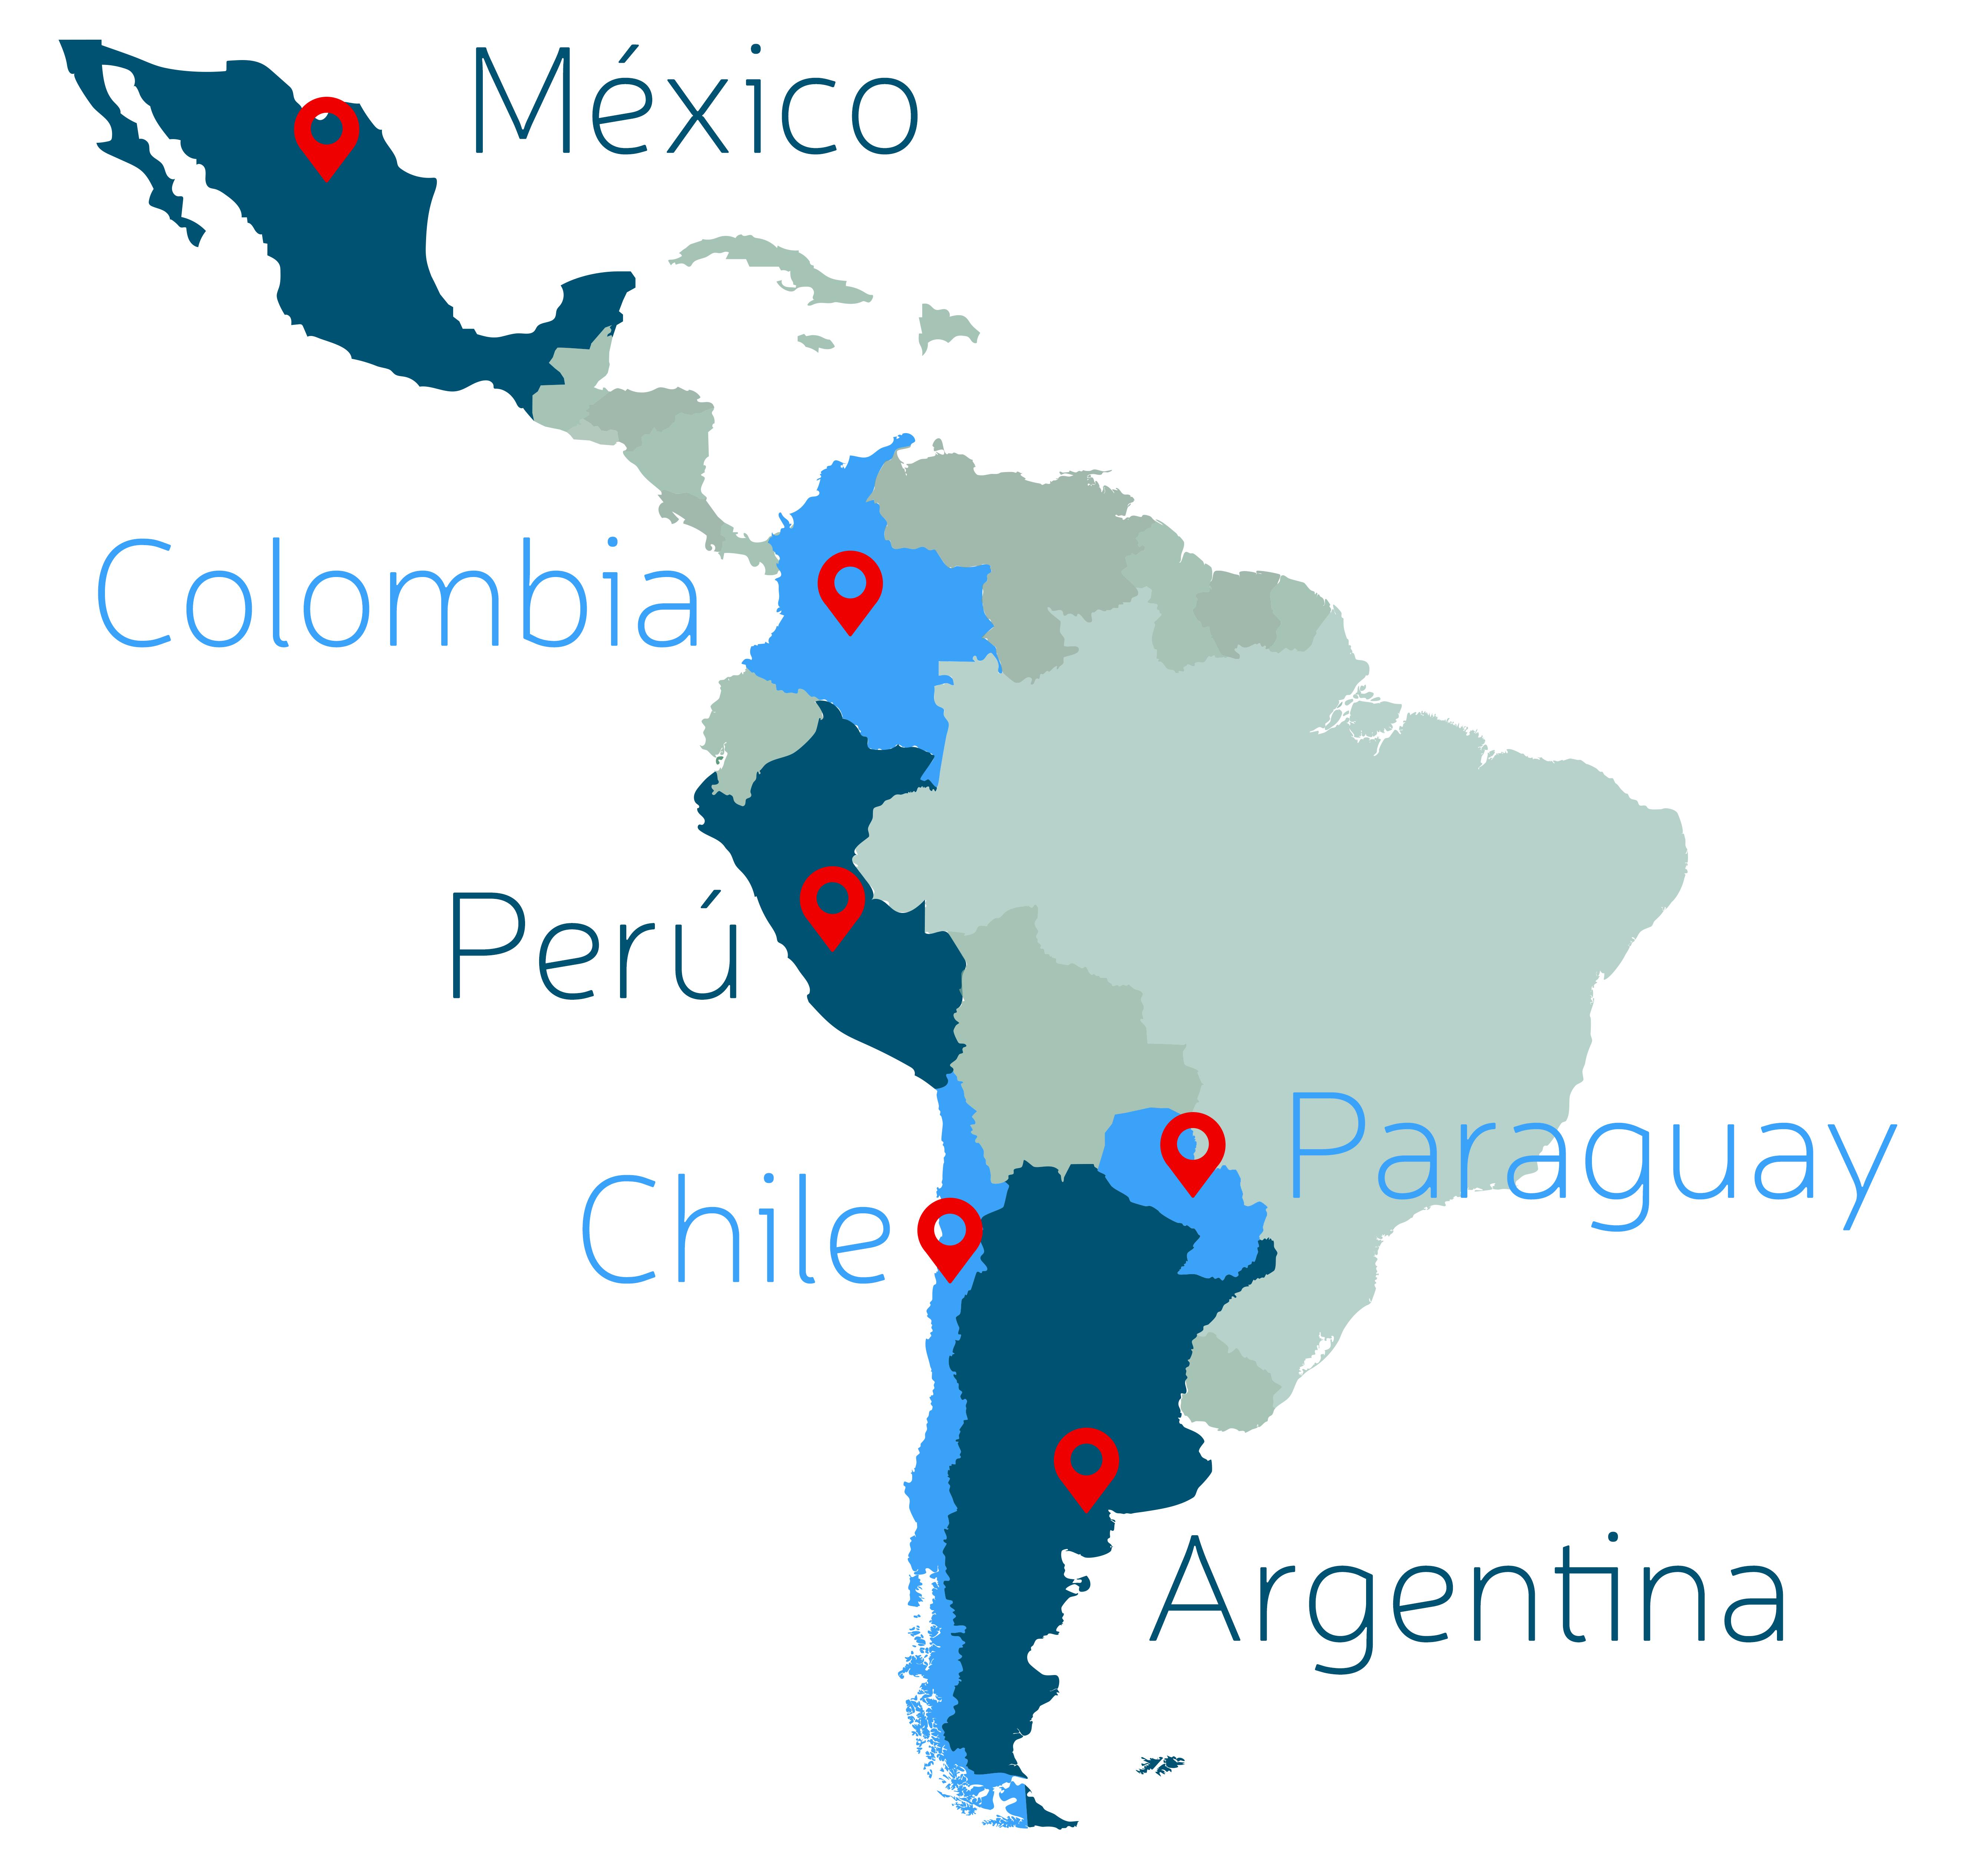 Mapa Latinoamericano